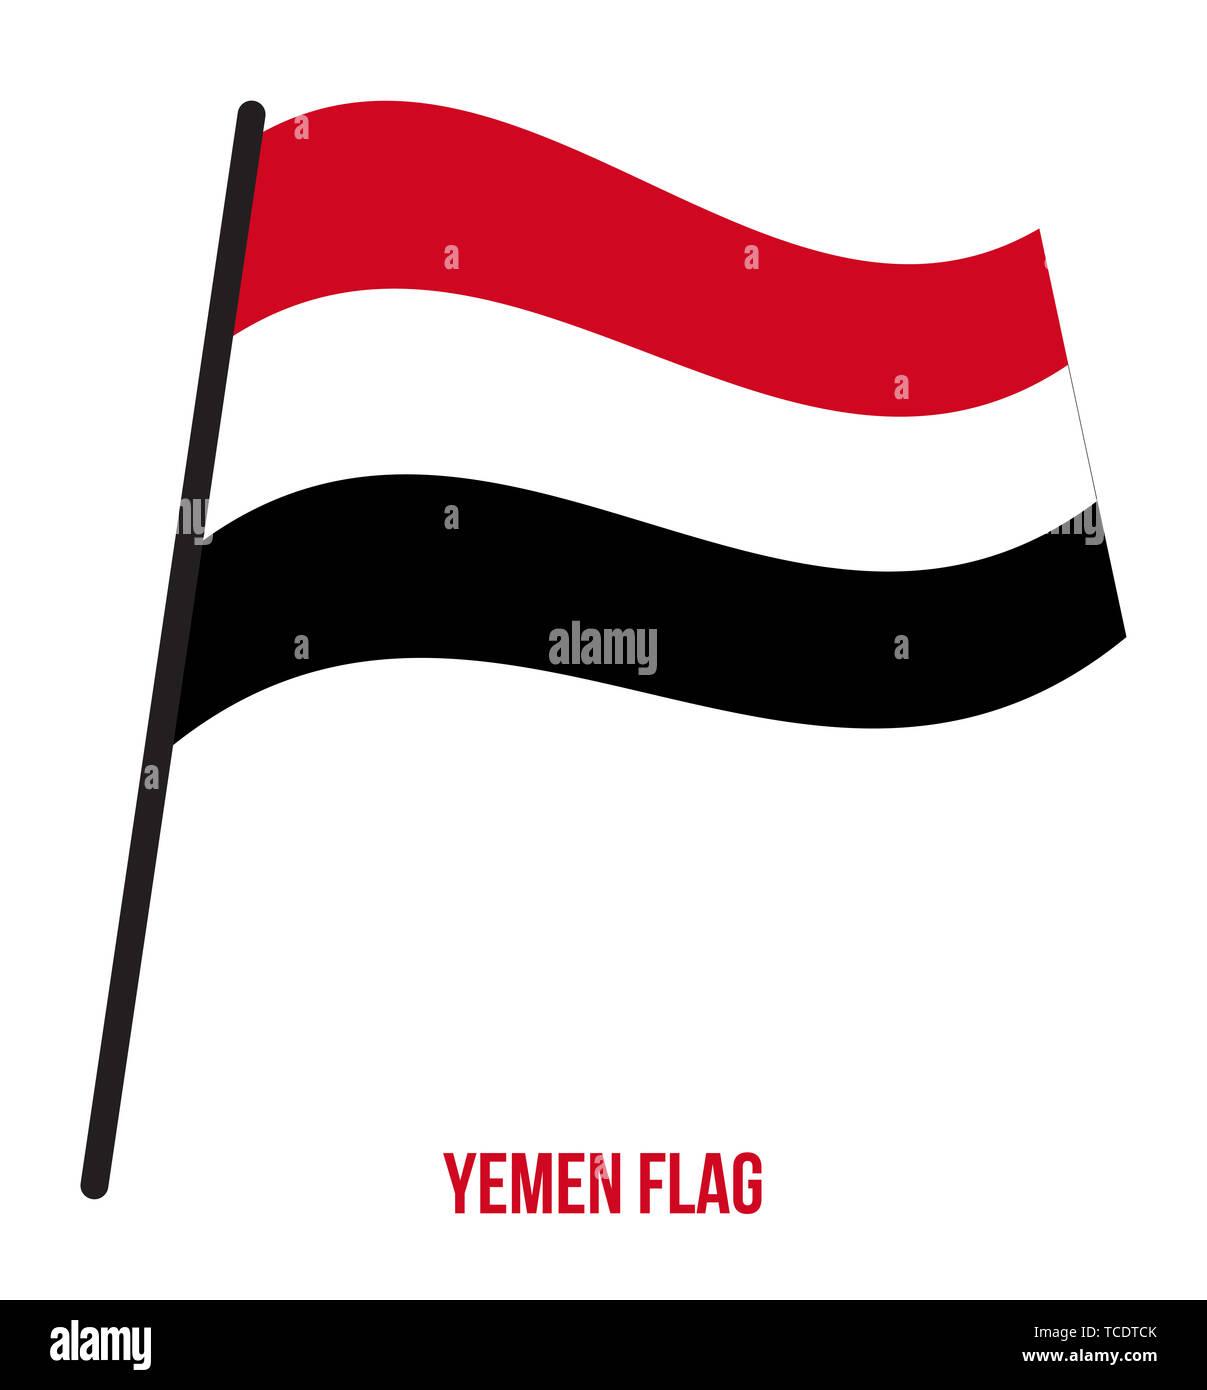 Yemen Flag Waving Vector Illustration on White Background. Yemen National Flag. Stock Photo